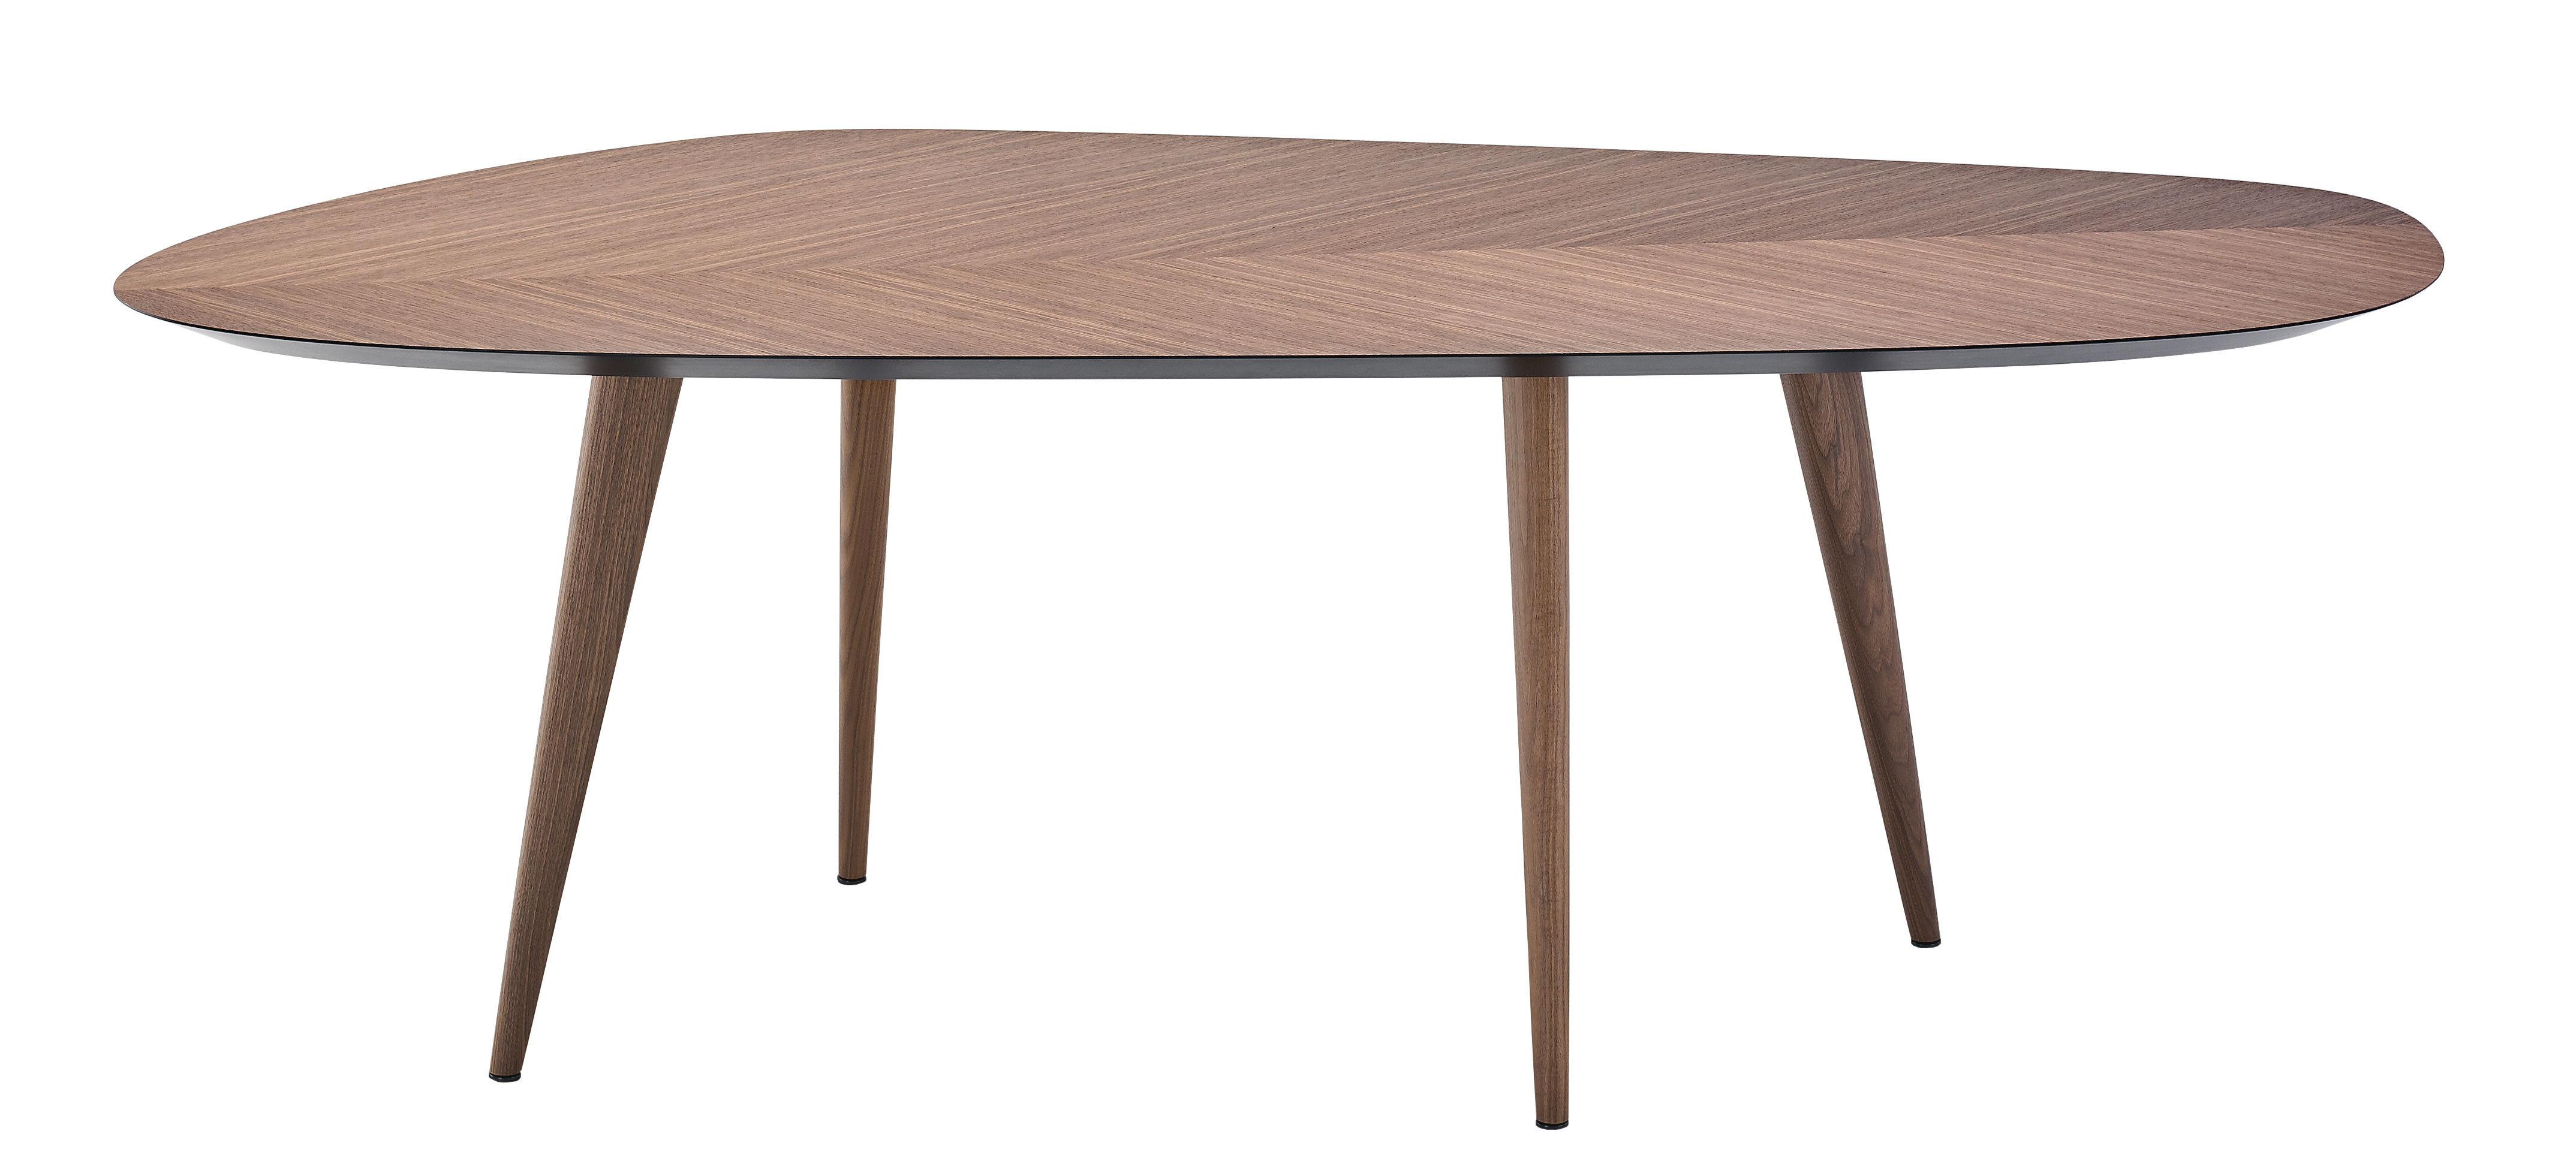 table tweed zanotta noyer dessous plateau noir h. Black Bedroom Furniture Sets. Home Design Ideas